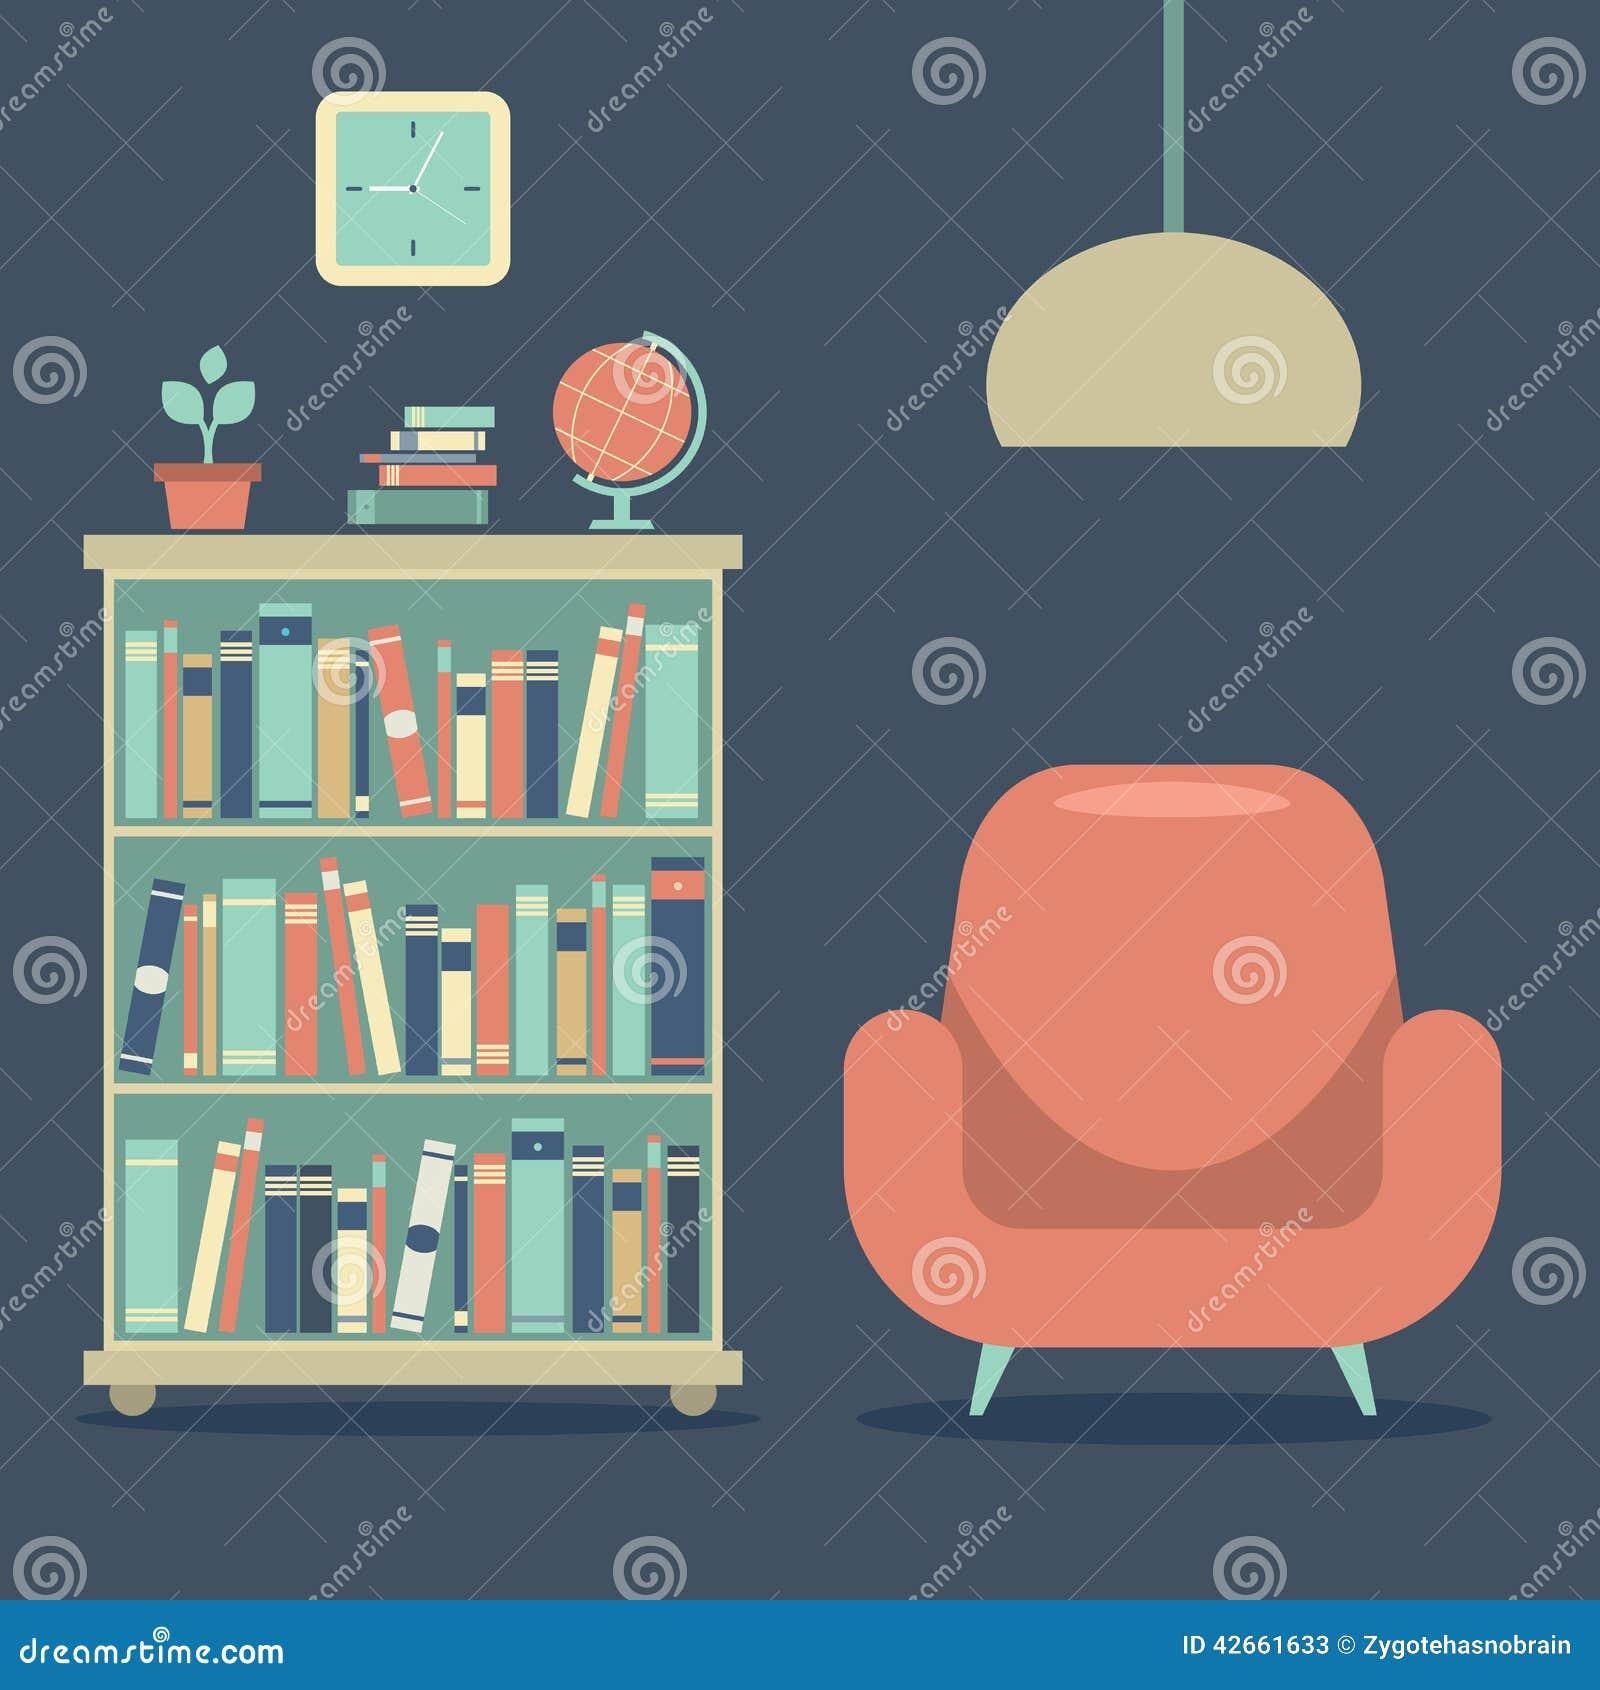 Rc Furniture Interior Design Stock Dealer ~ Vintage furniture sofa with globe royalty free stock image